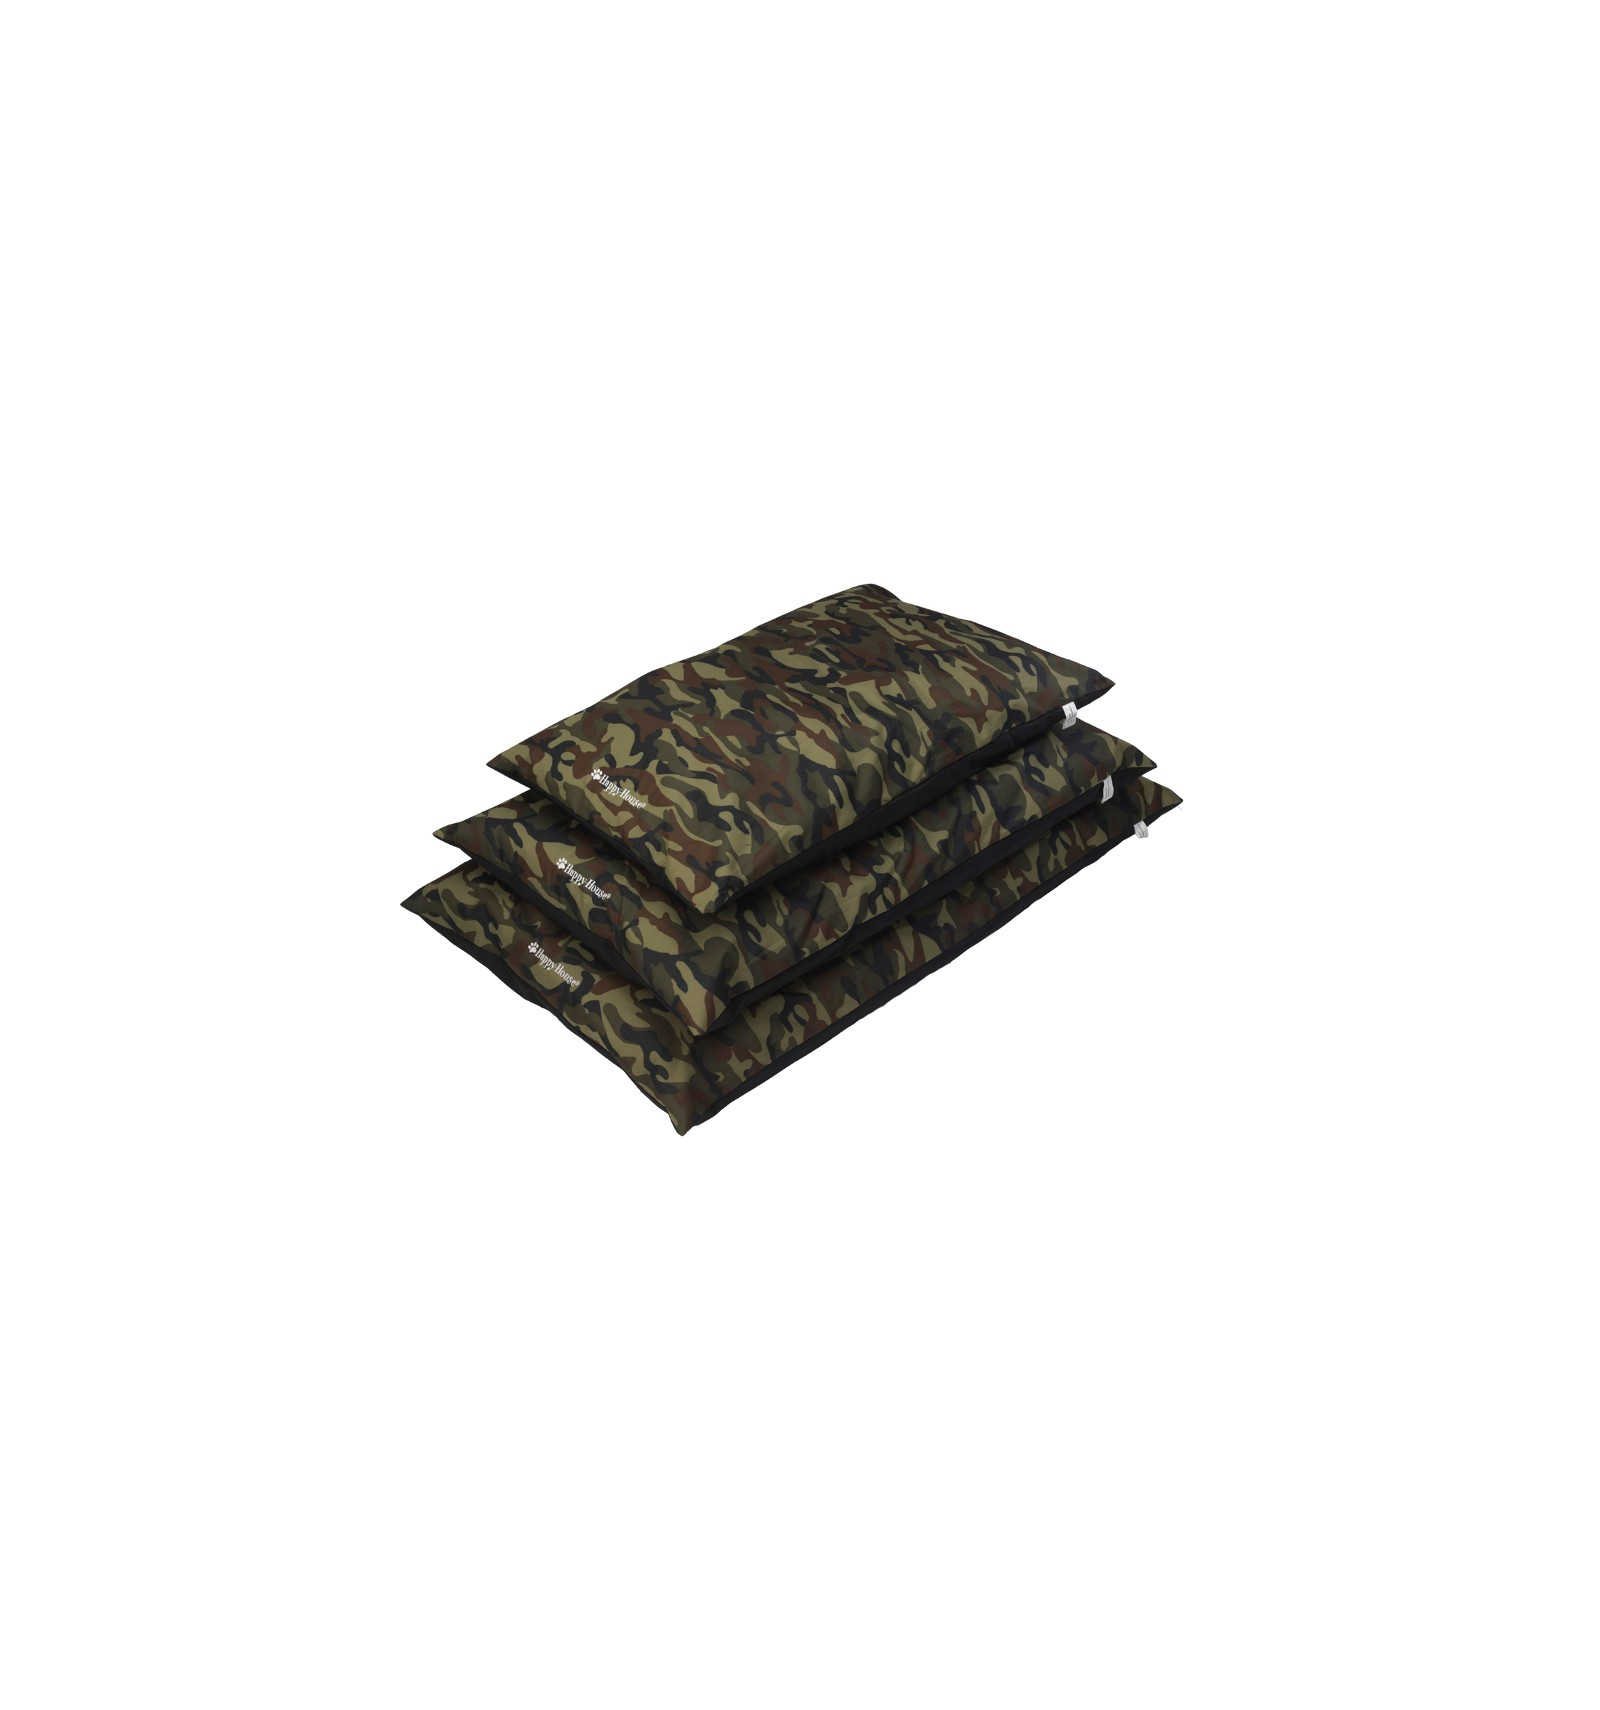 Cuscino csa camouflage